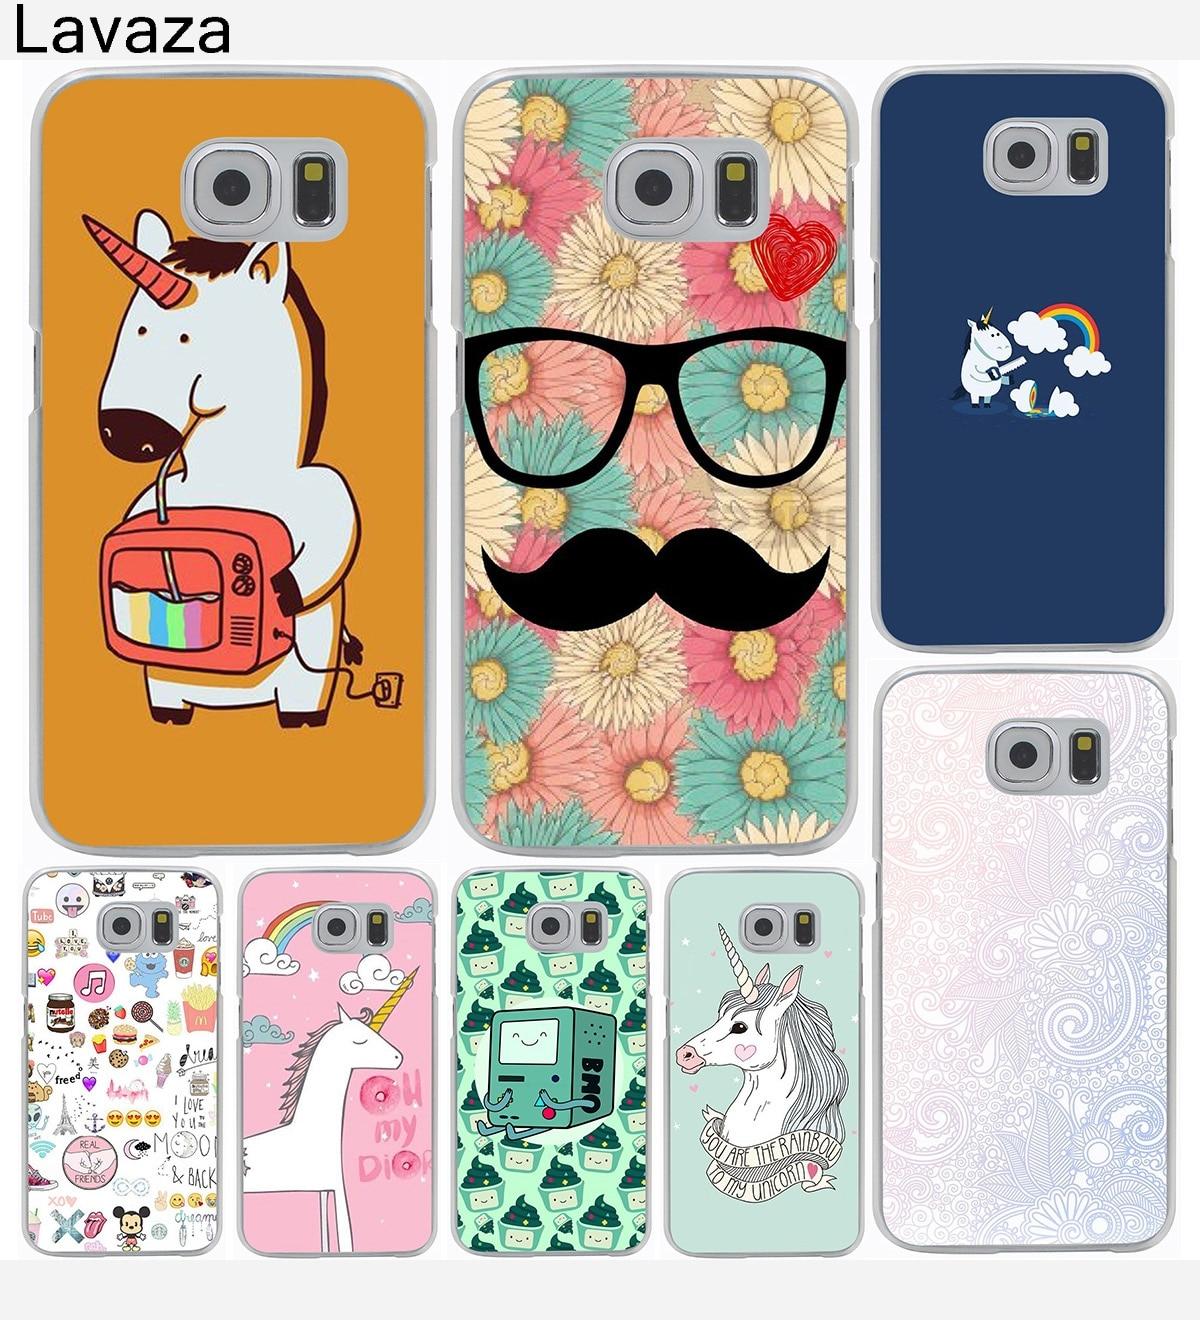 Unicorn Saw Clouds Rainbow Funny Hard Cover Case for Galaxy S3 S4 S5 & Mini S6 S7 S8 Edge Plus